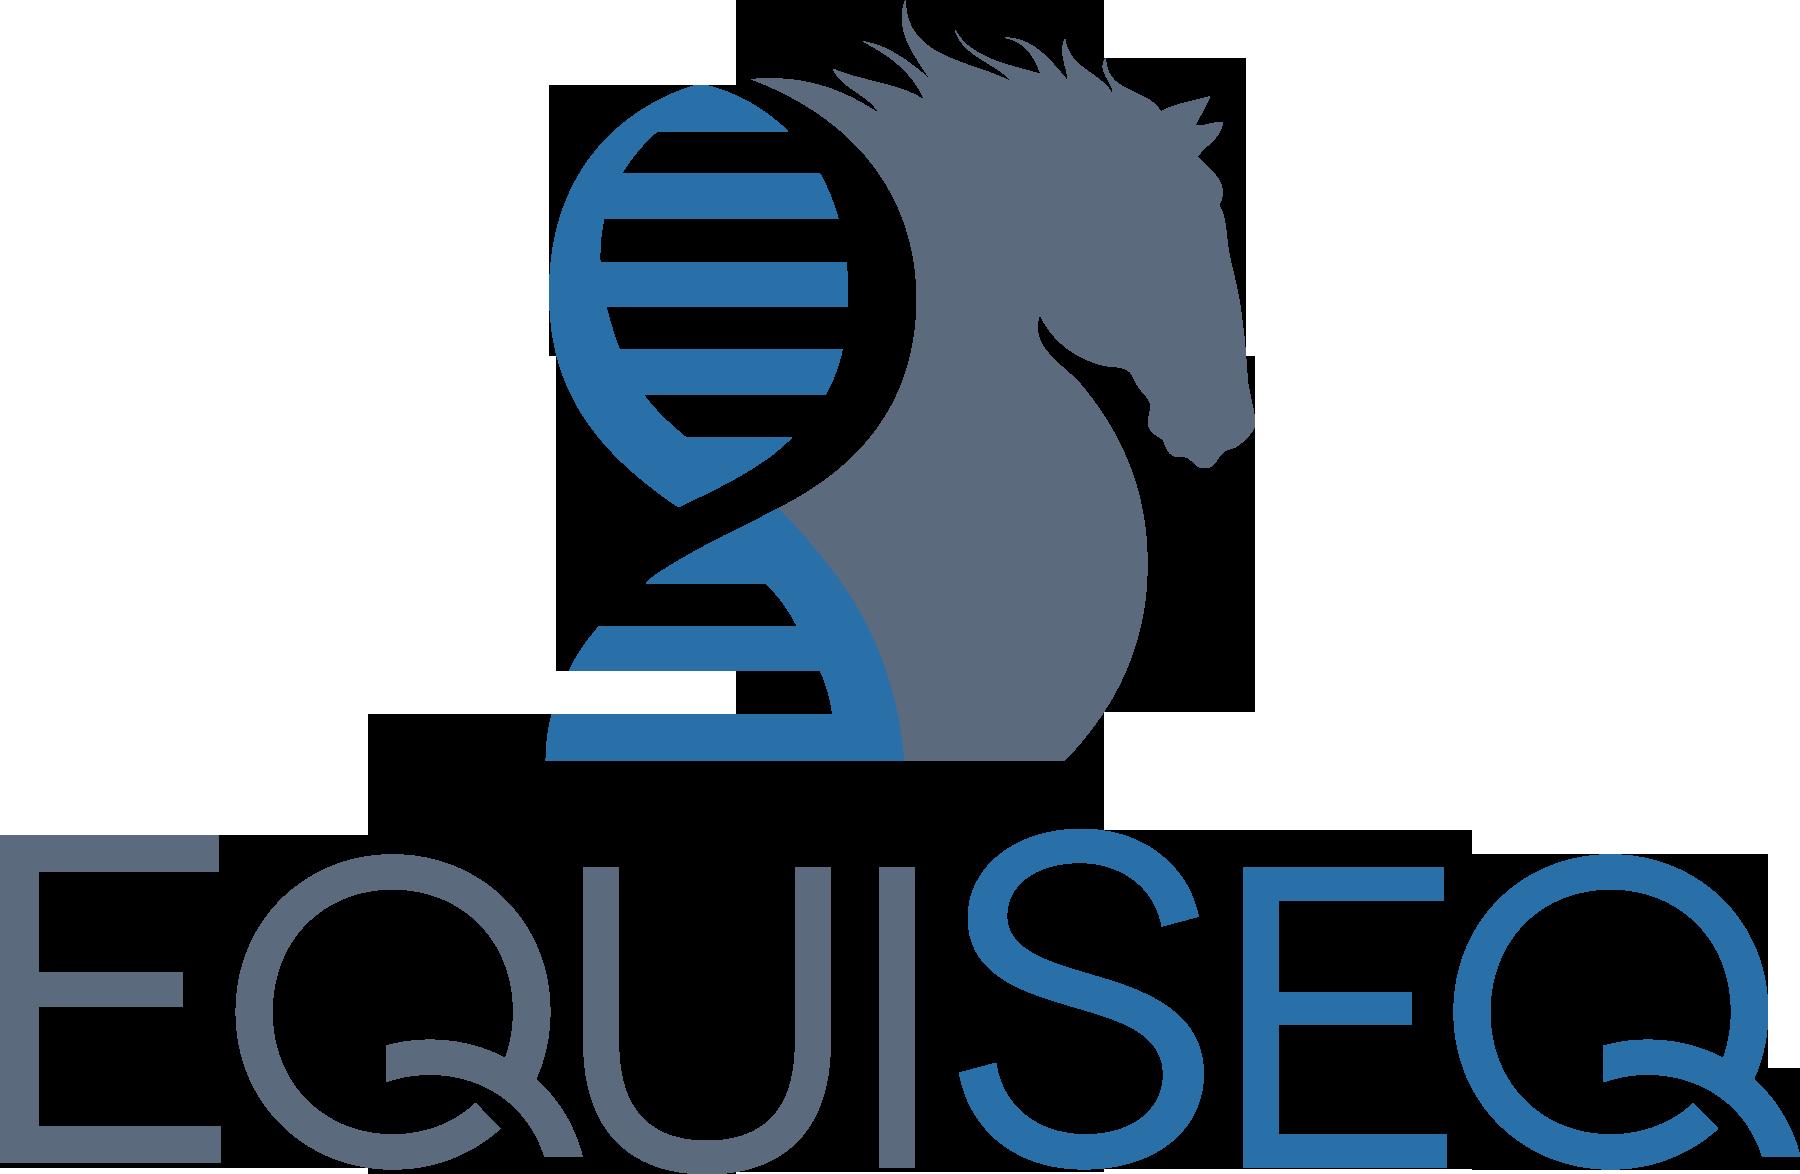 EquiSeq company logo